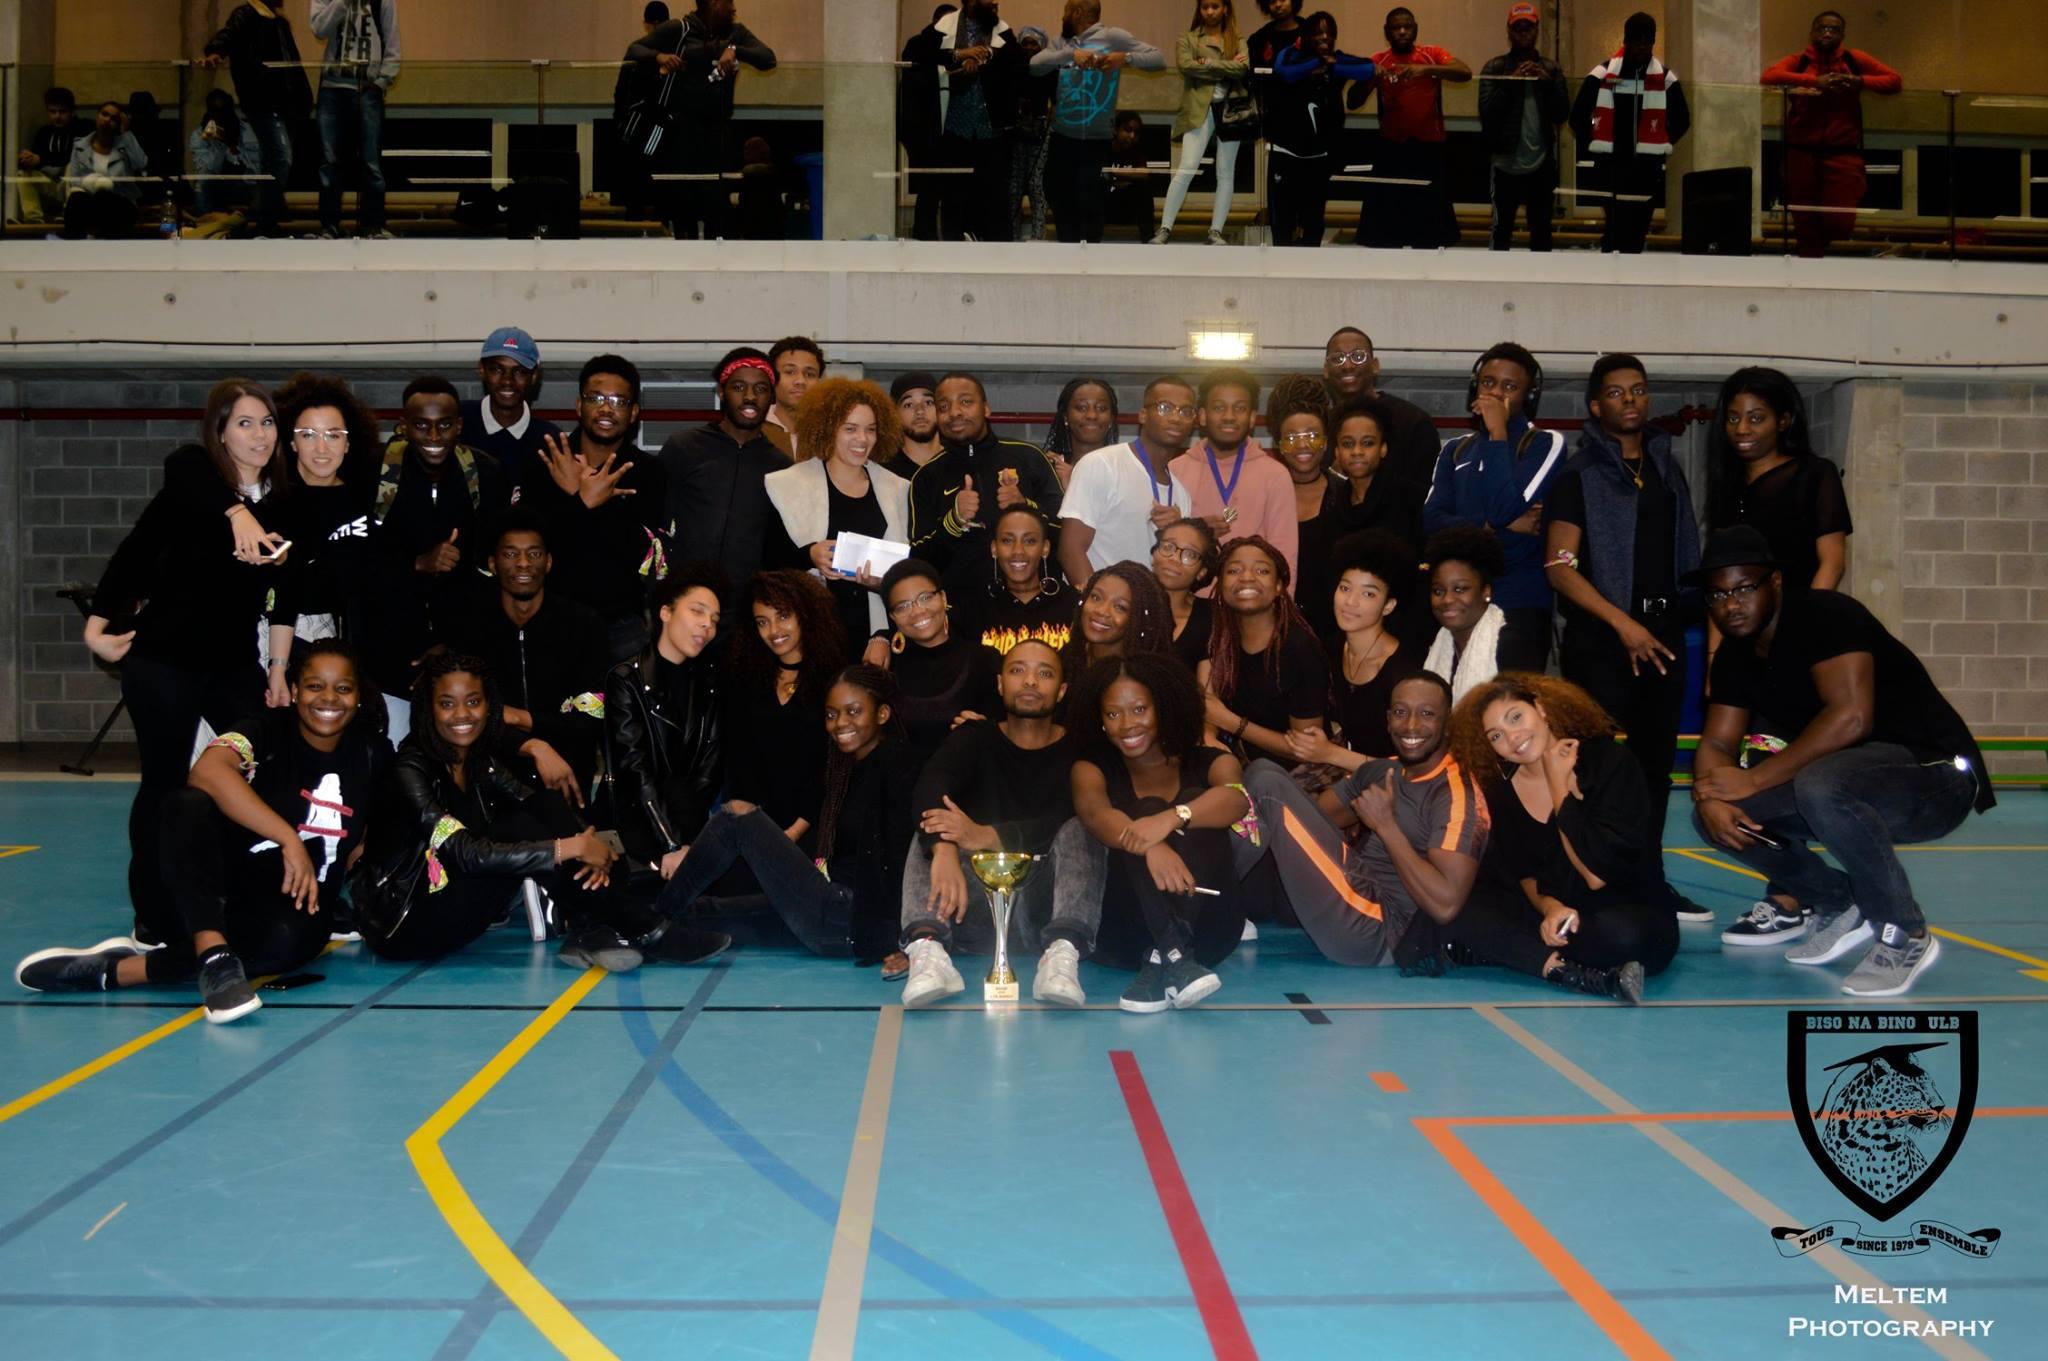 Association d'etudiants africains en belgique ulb